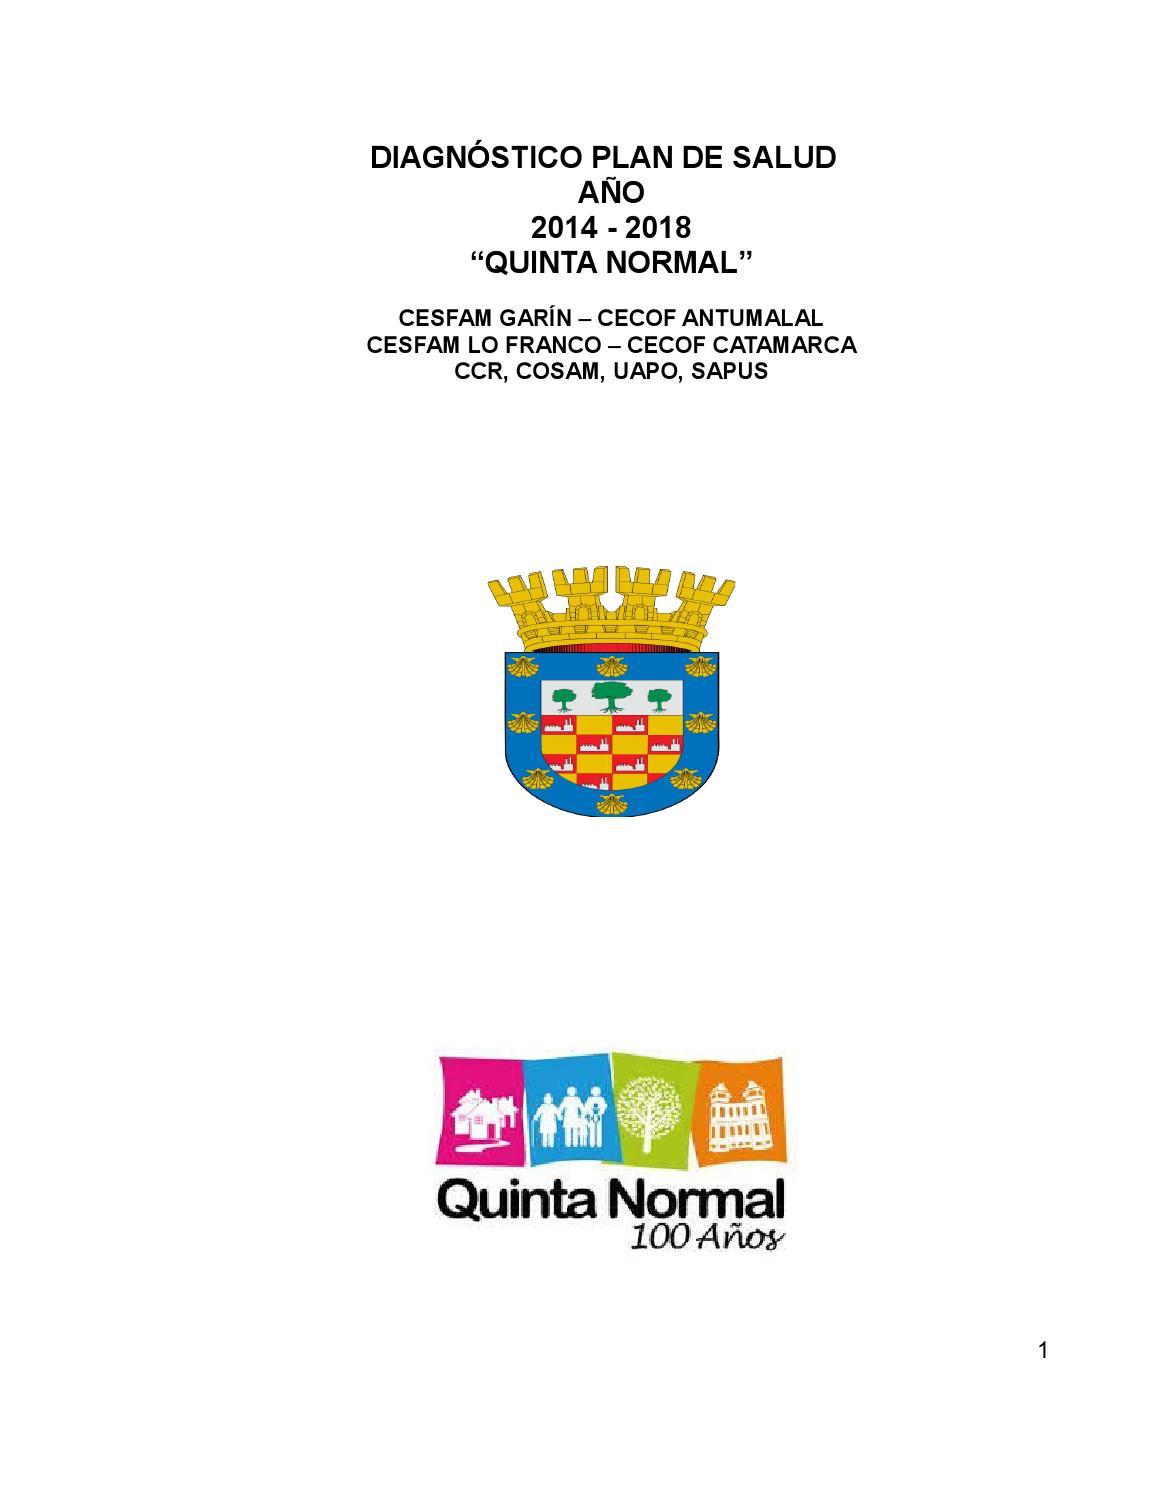 Calendario Escolar 2020 19 Aragon.Plan De Salud Comunal 2014 2018 V 2 By Cesfamlofranco Issuu